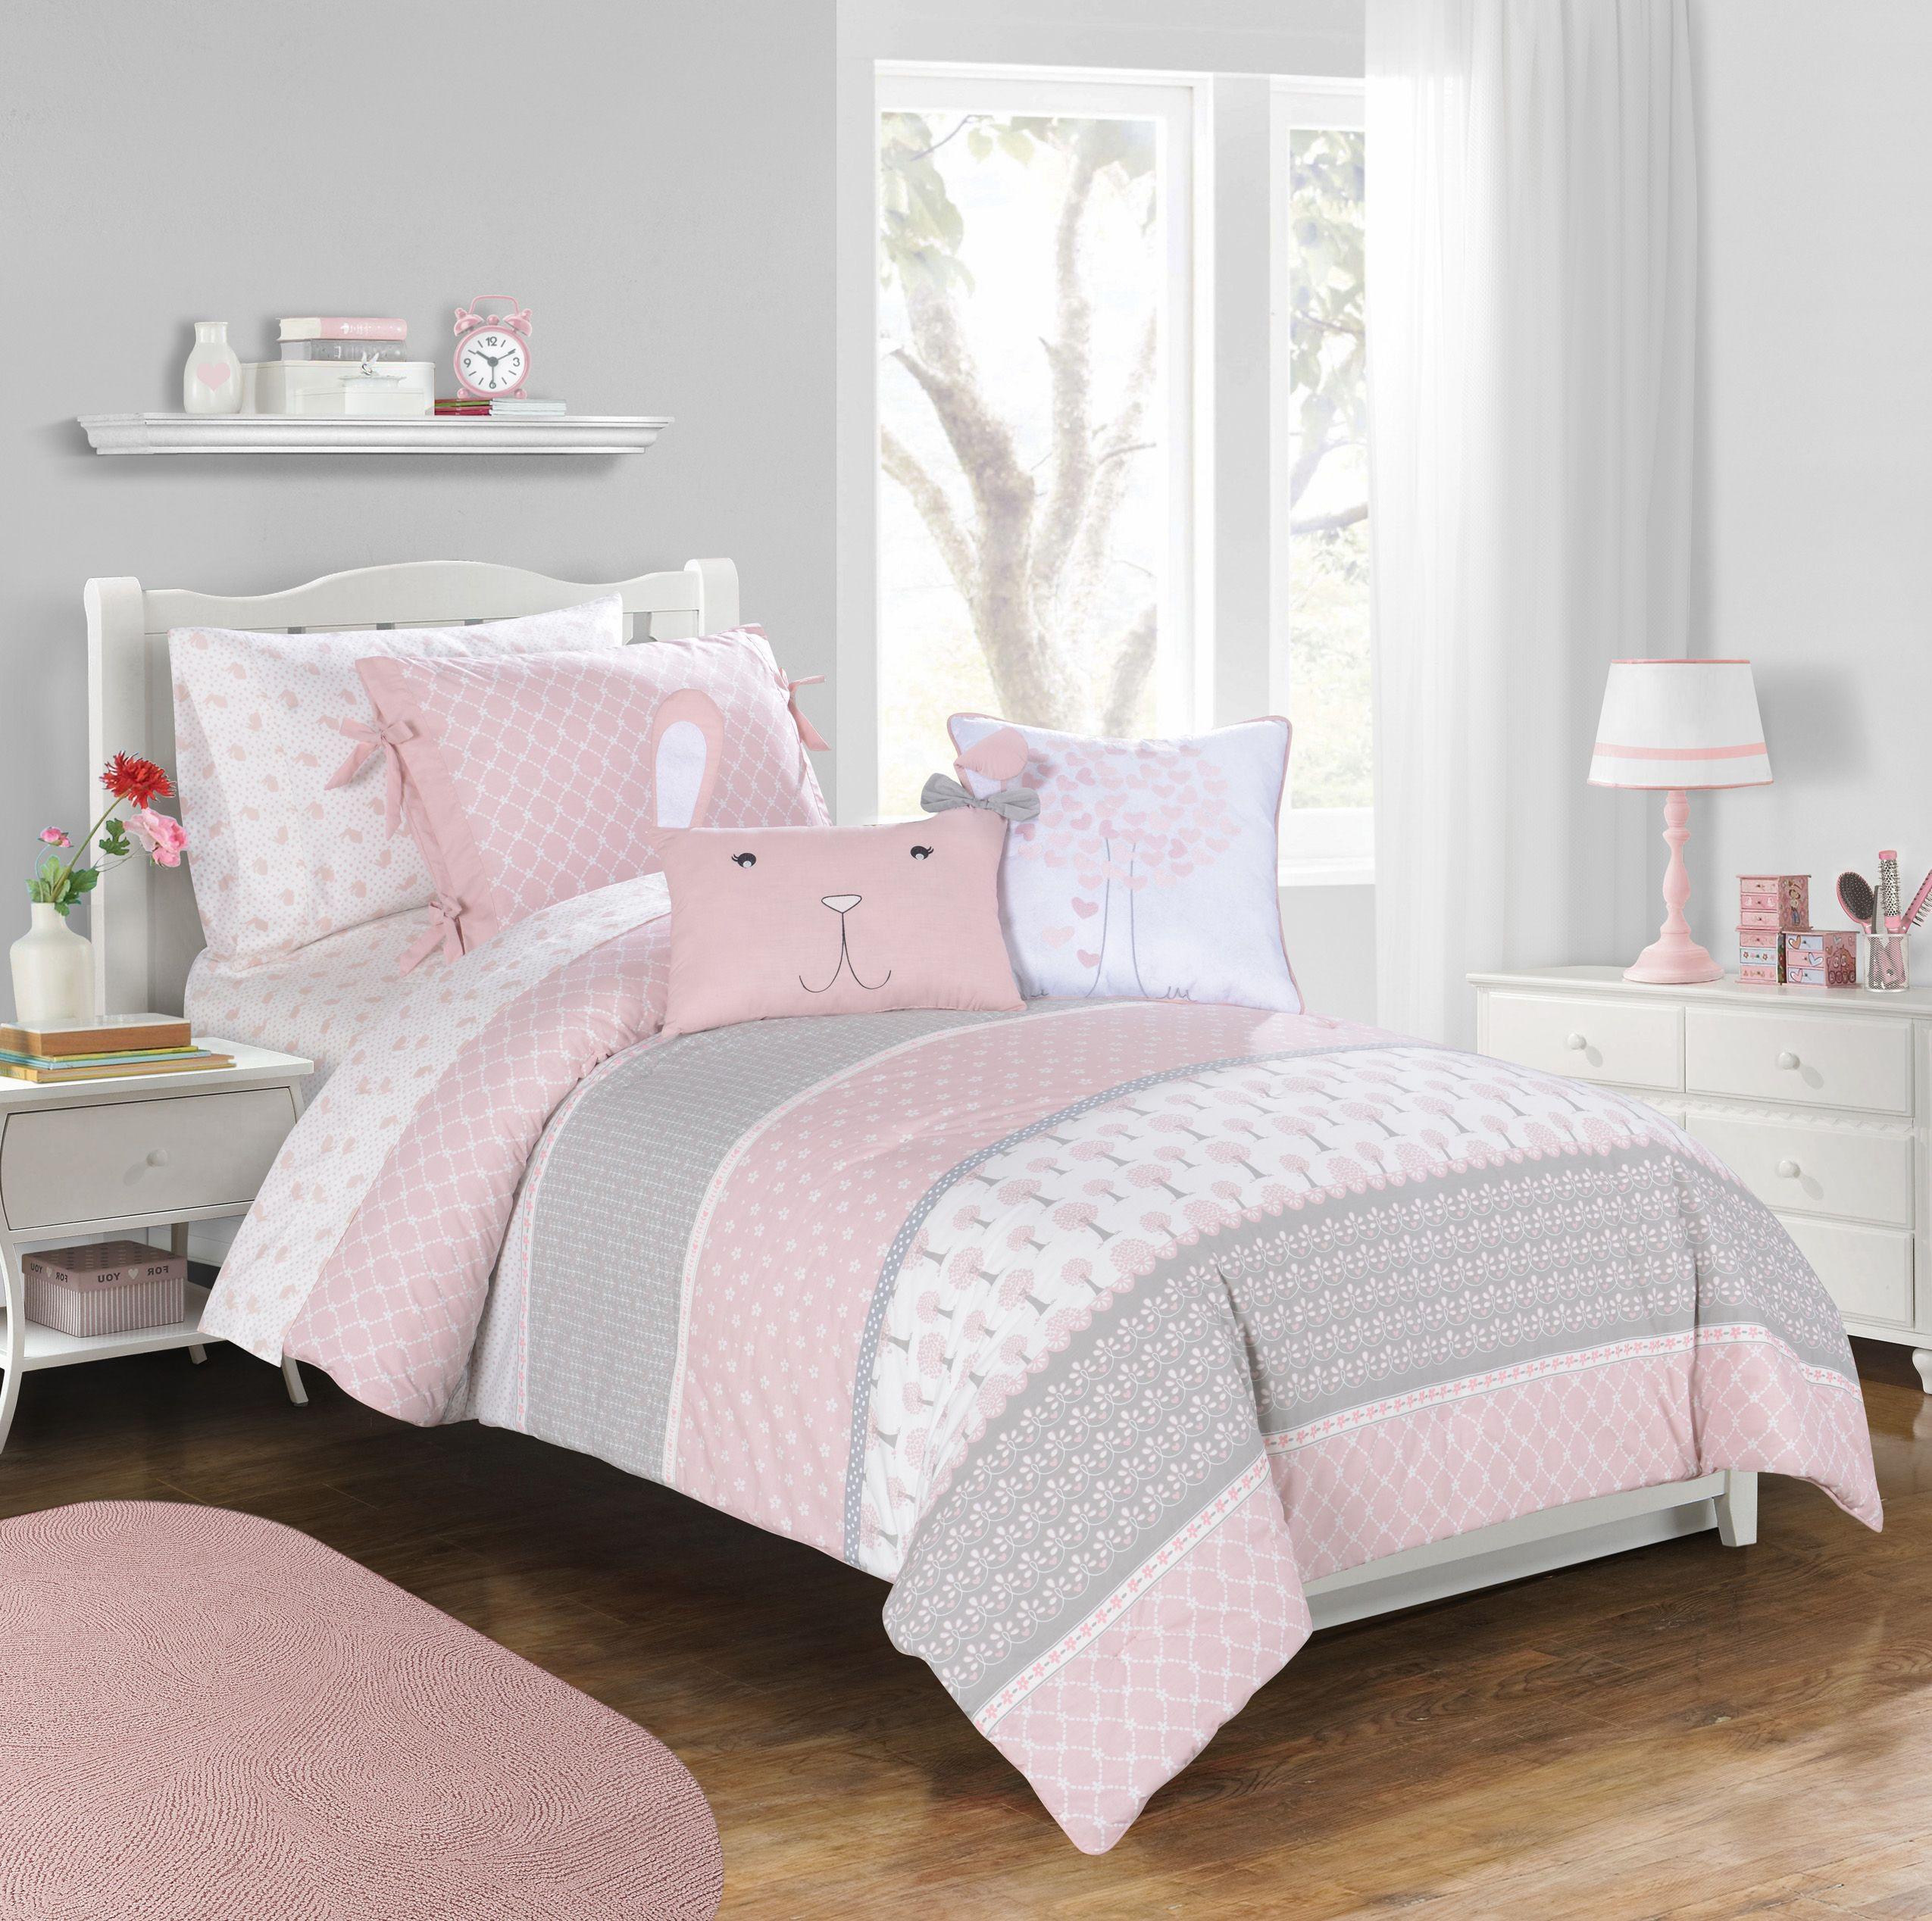 Twin Size Bedroom Sets For Girl Novocom Top